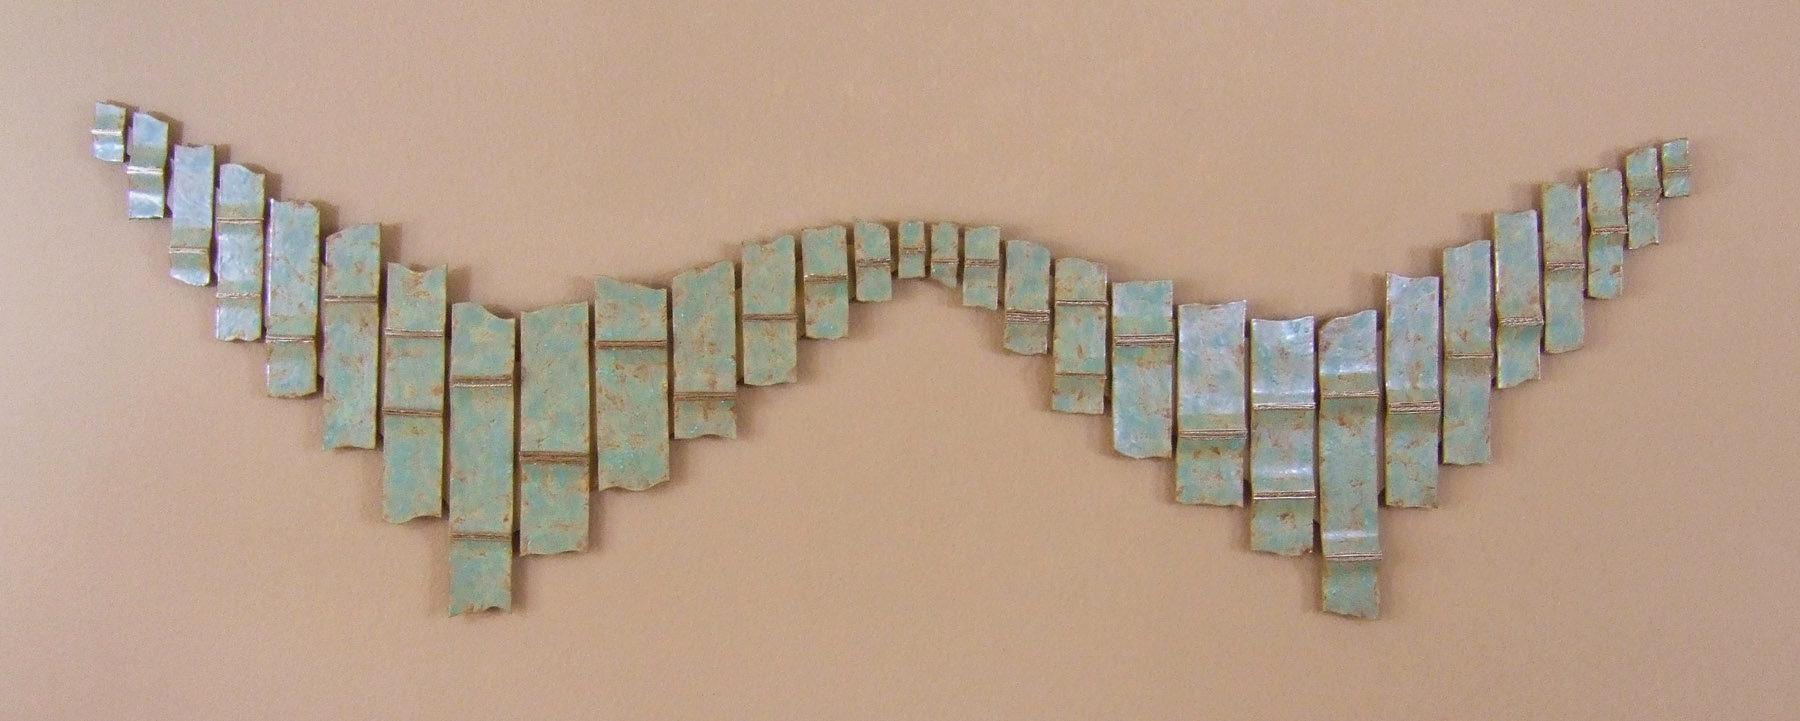 Featured Image of Italian Ceramic Wall Art